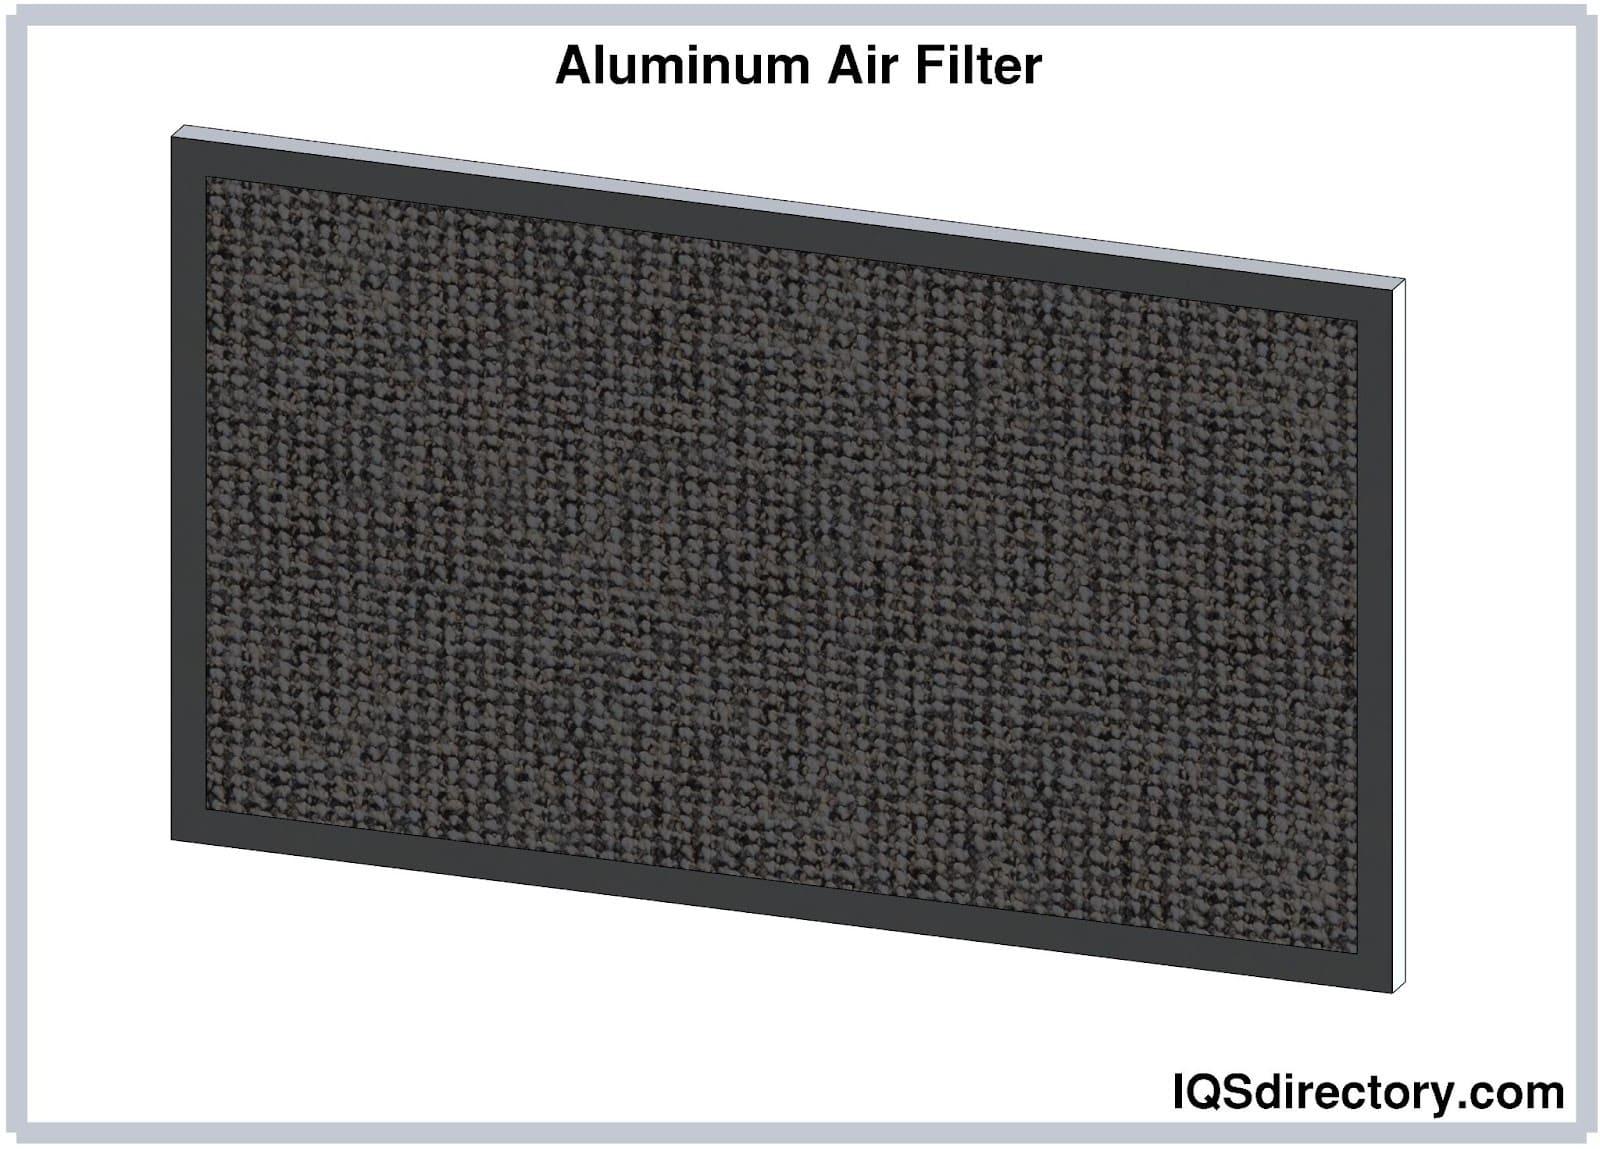 Aluminum Air Filter